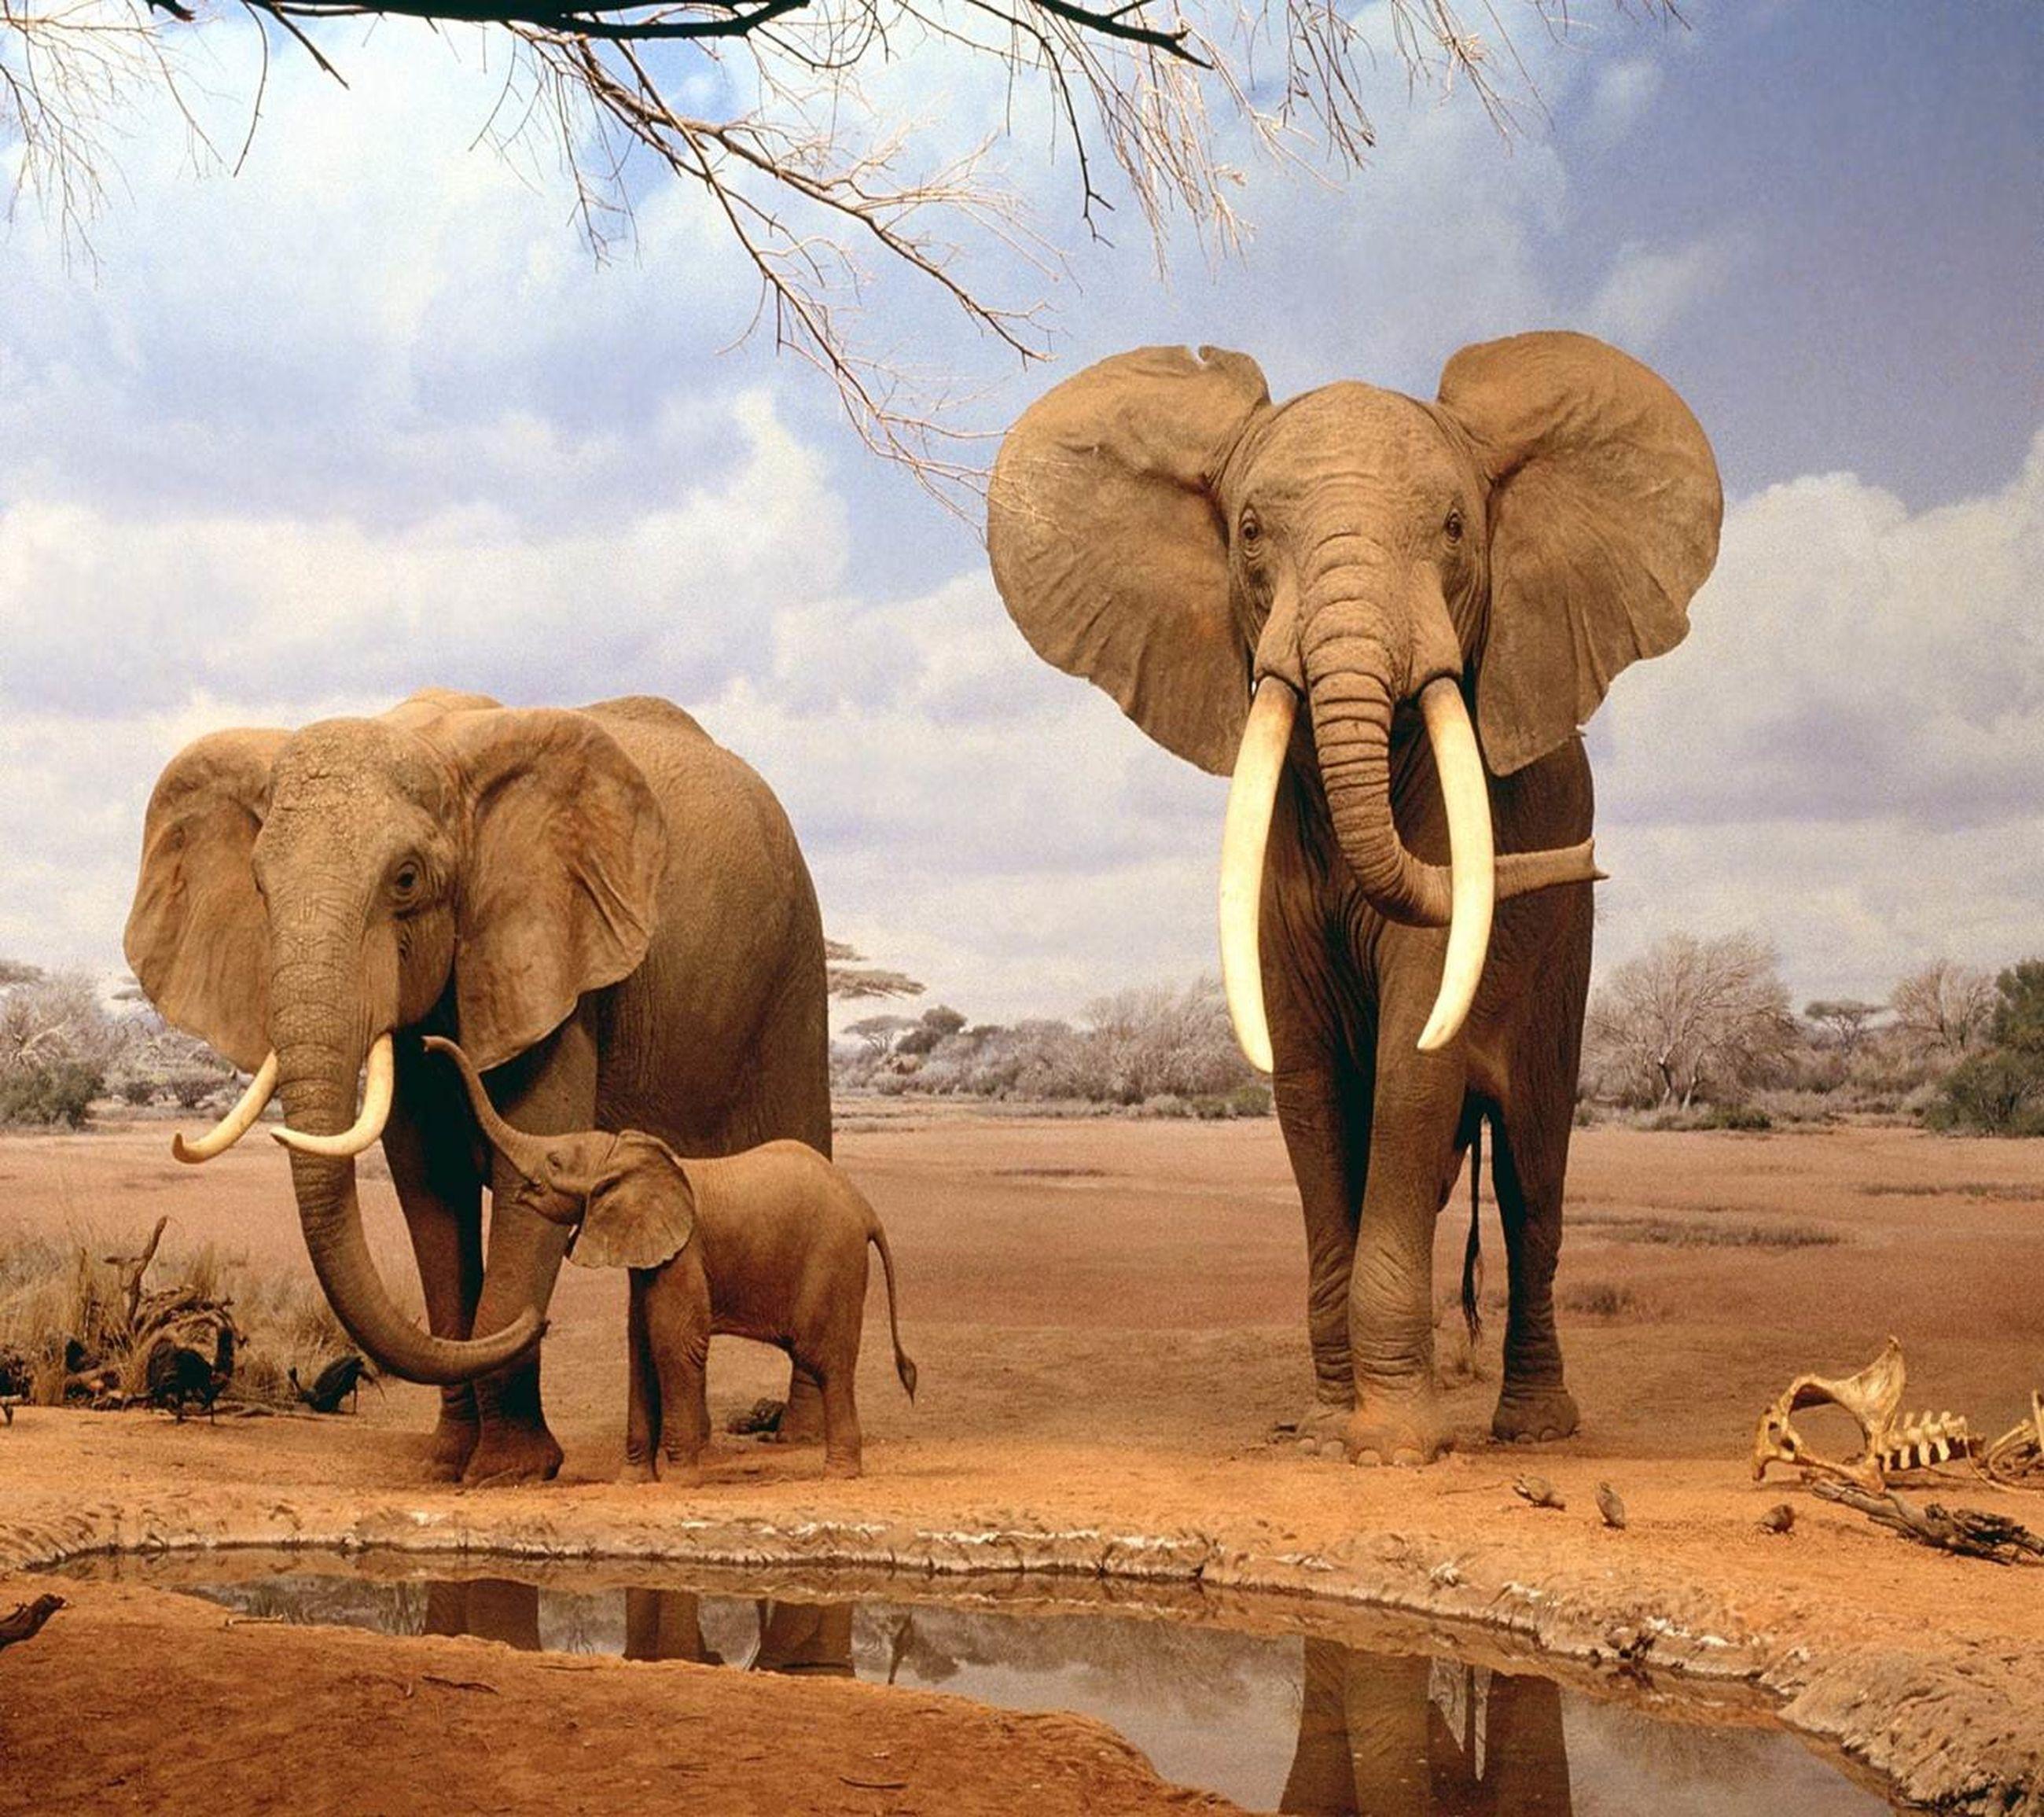 animal themes, elephant, mammal, vertebrate, two animals, herbivorous, horse, domestic animals, zoology, togetherness, animal, elephant calf, full length, young animal, sky, trunk, animal trunk, care, safari animals, outdoors, day, field, working animals, livestock, cloud - sky, non-urban scene